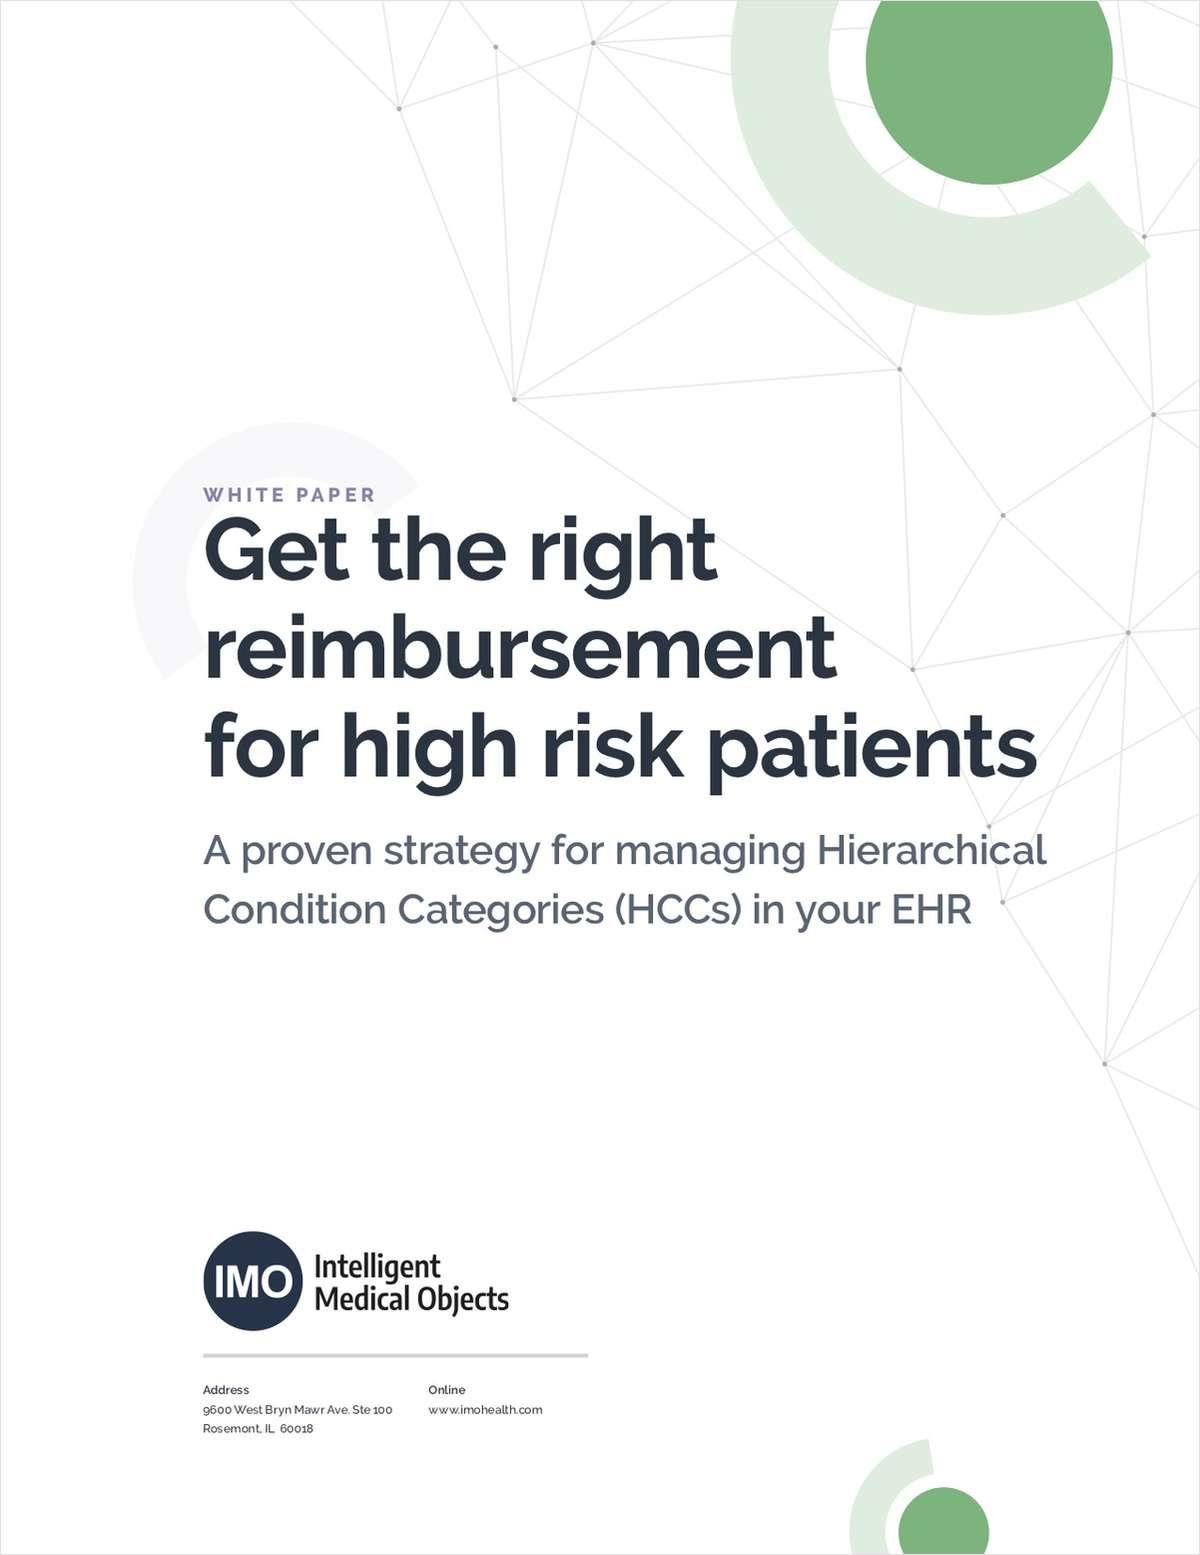 Get the right reimbursement for high-risk patients